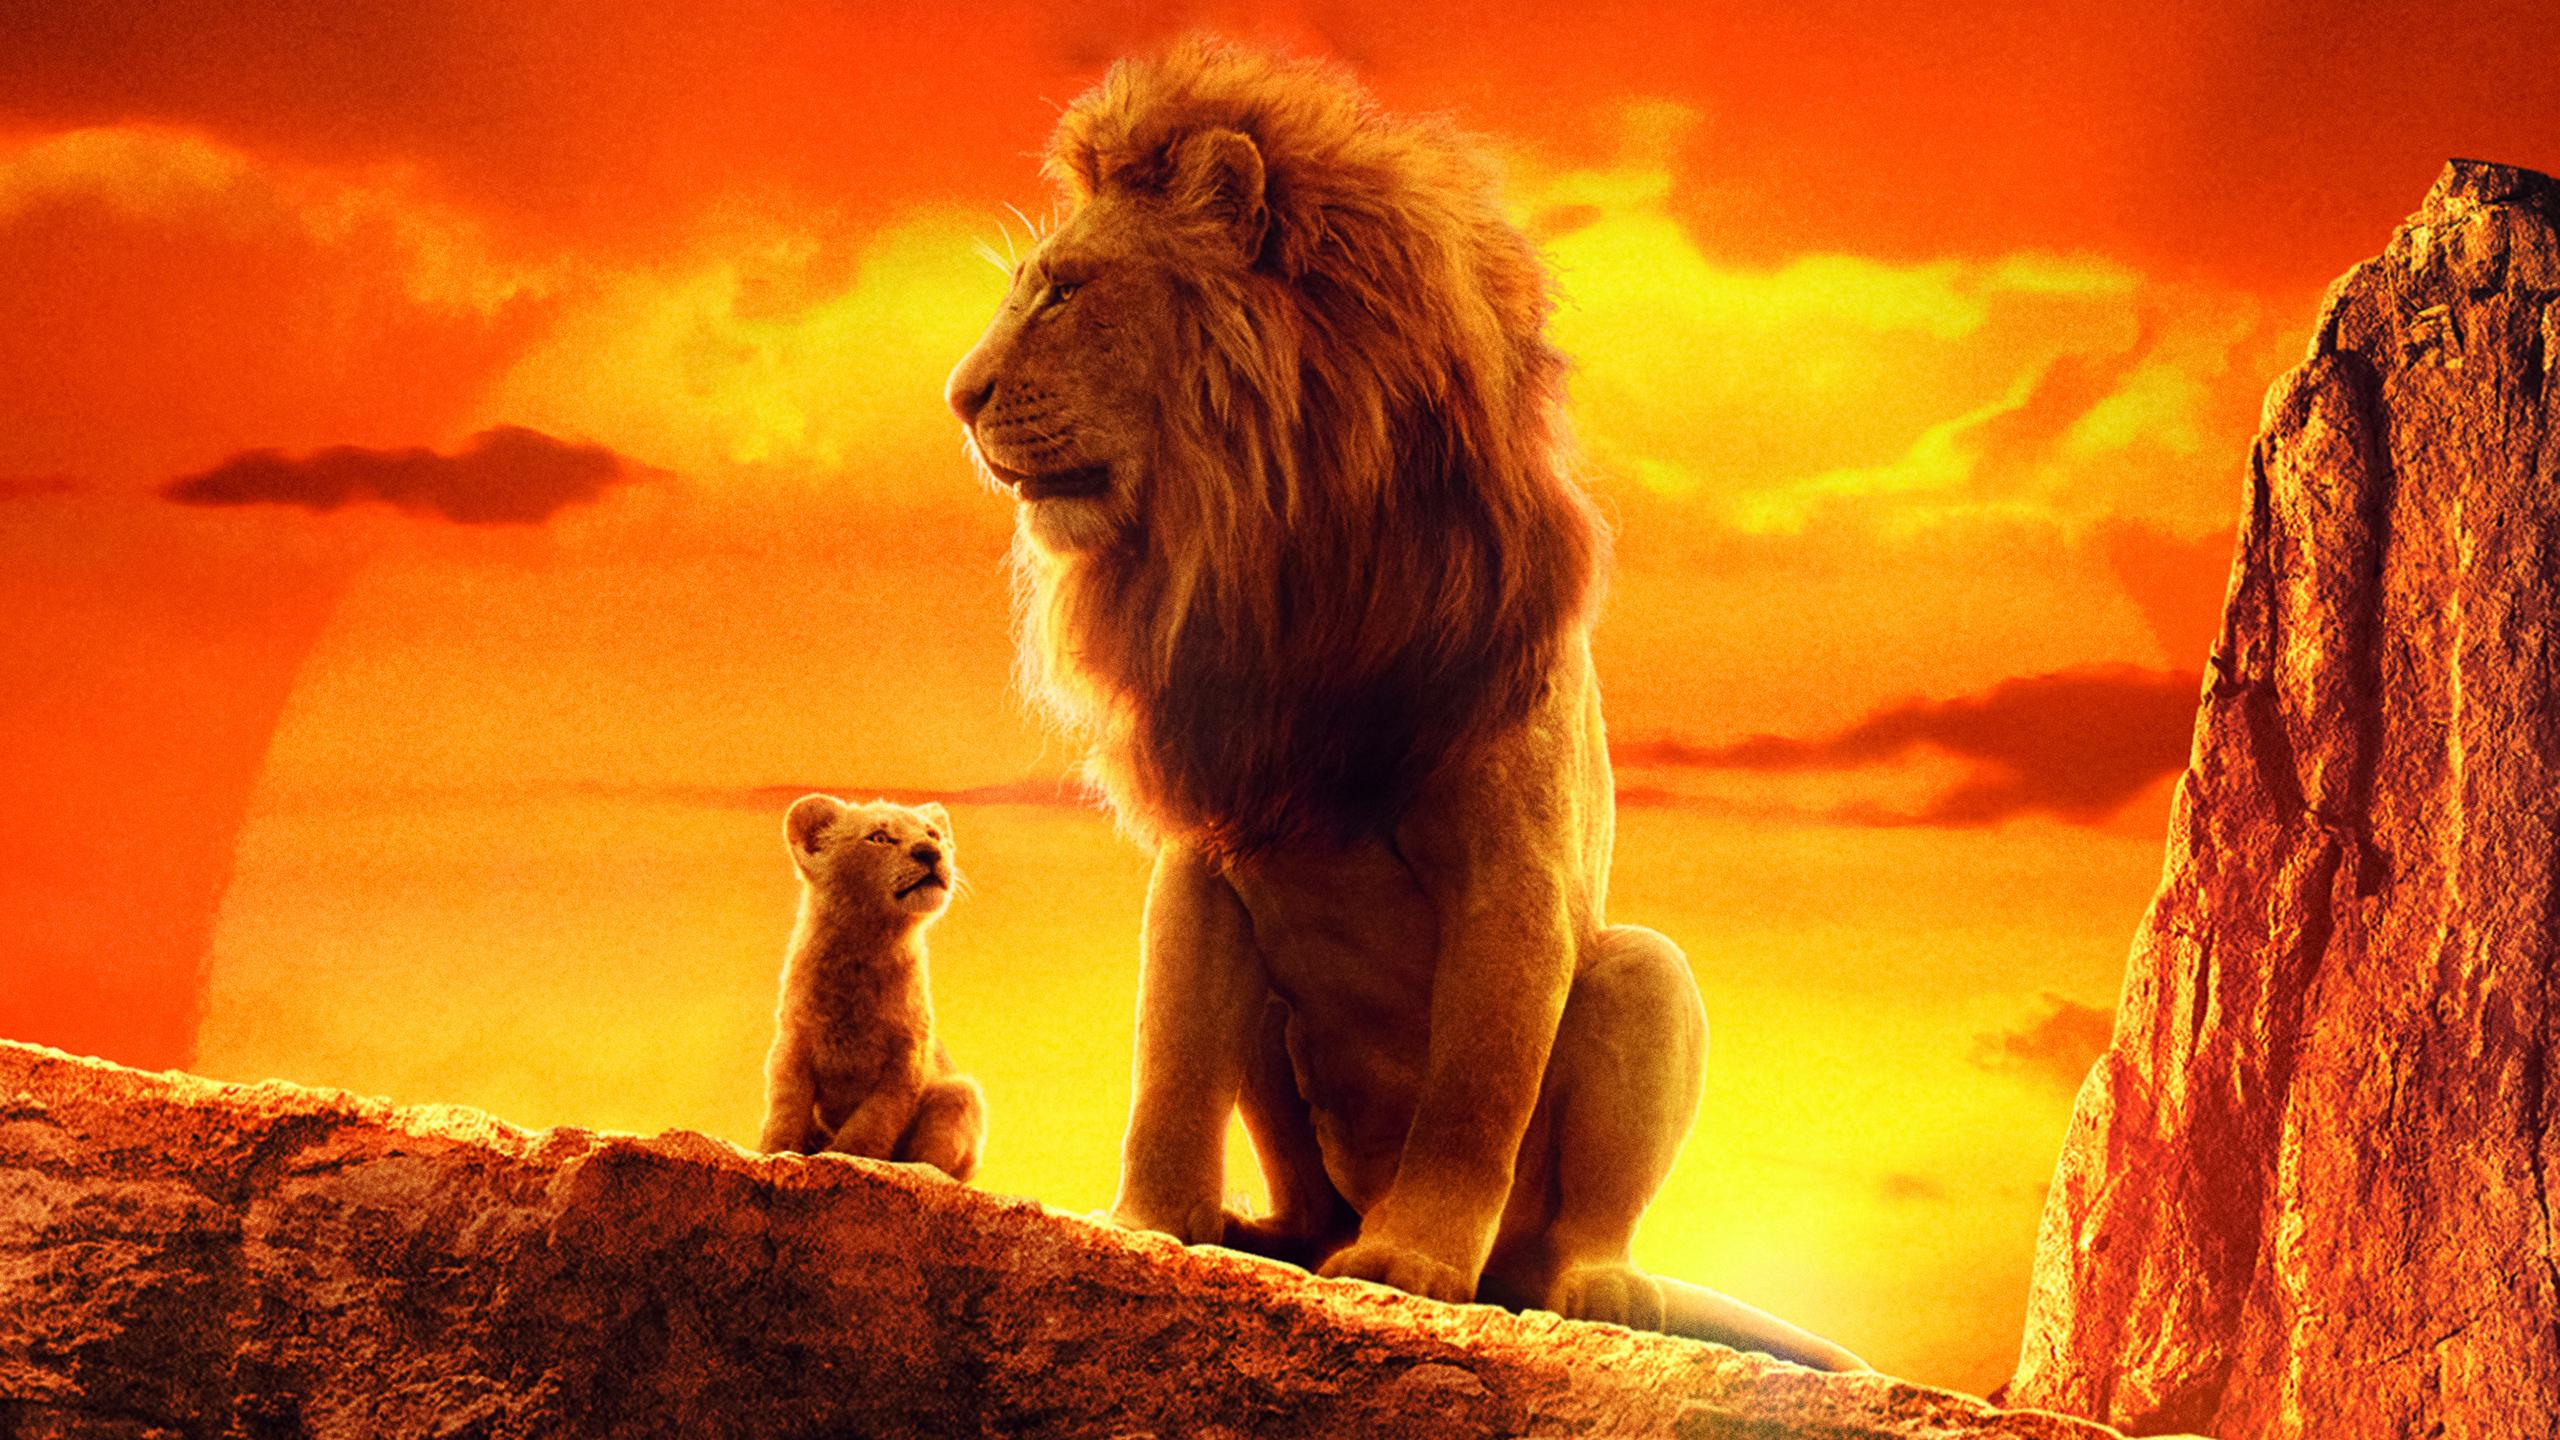 2560x1440 The Lion King 2019 4k Movie 1440p Resolution Hd 4k